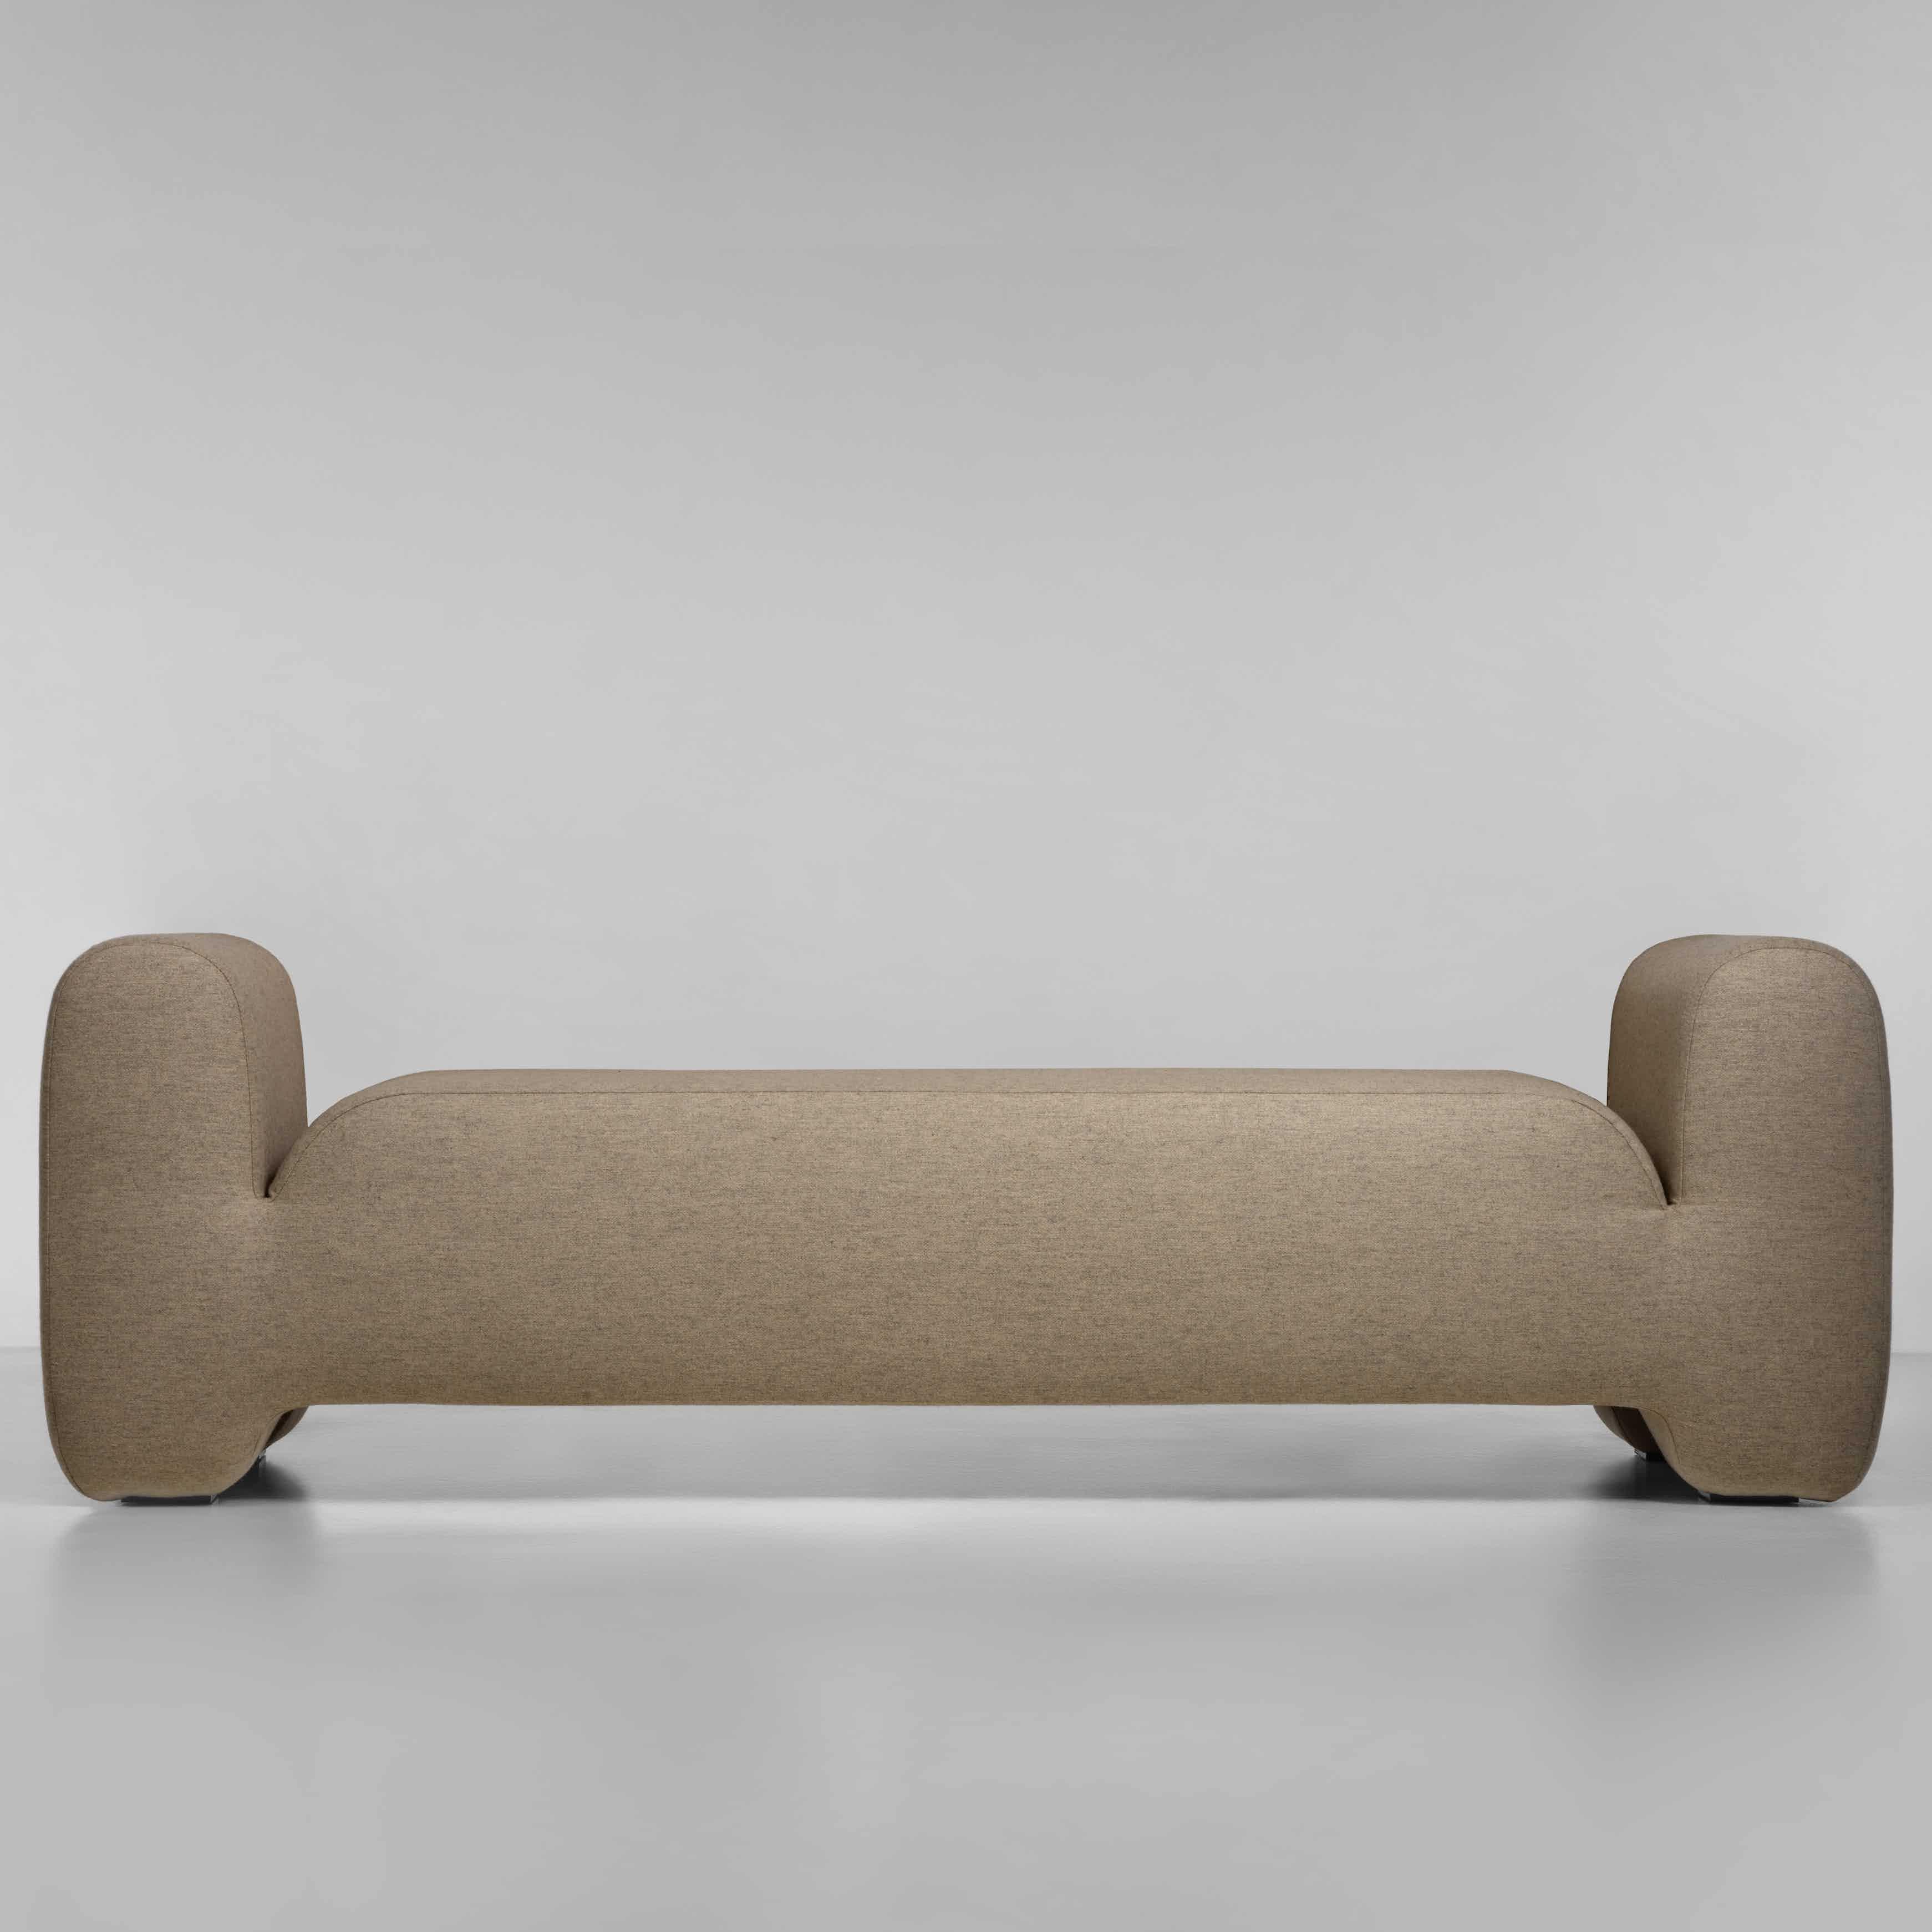 Faina furniture pampukh bench thumbnail haute living